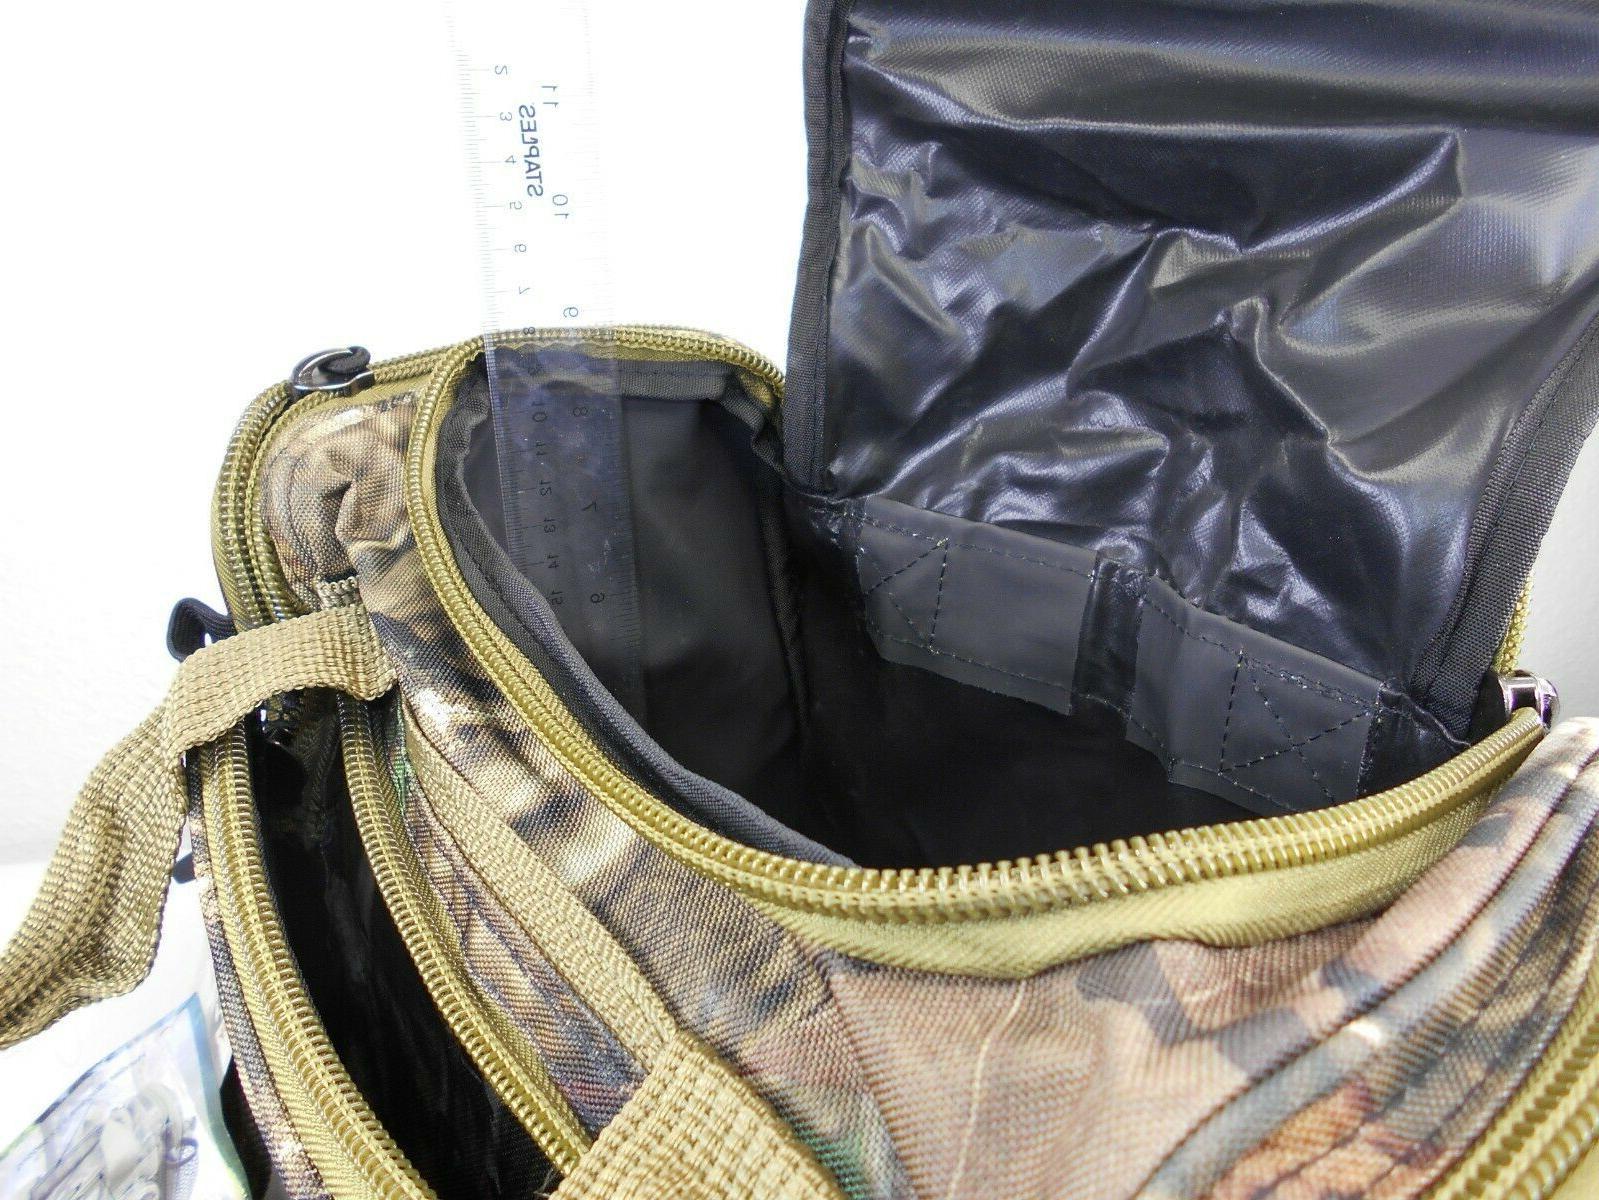 Bag gear bag travel